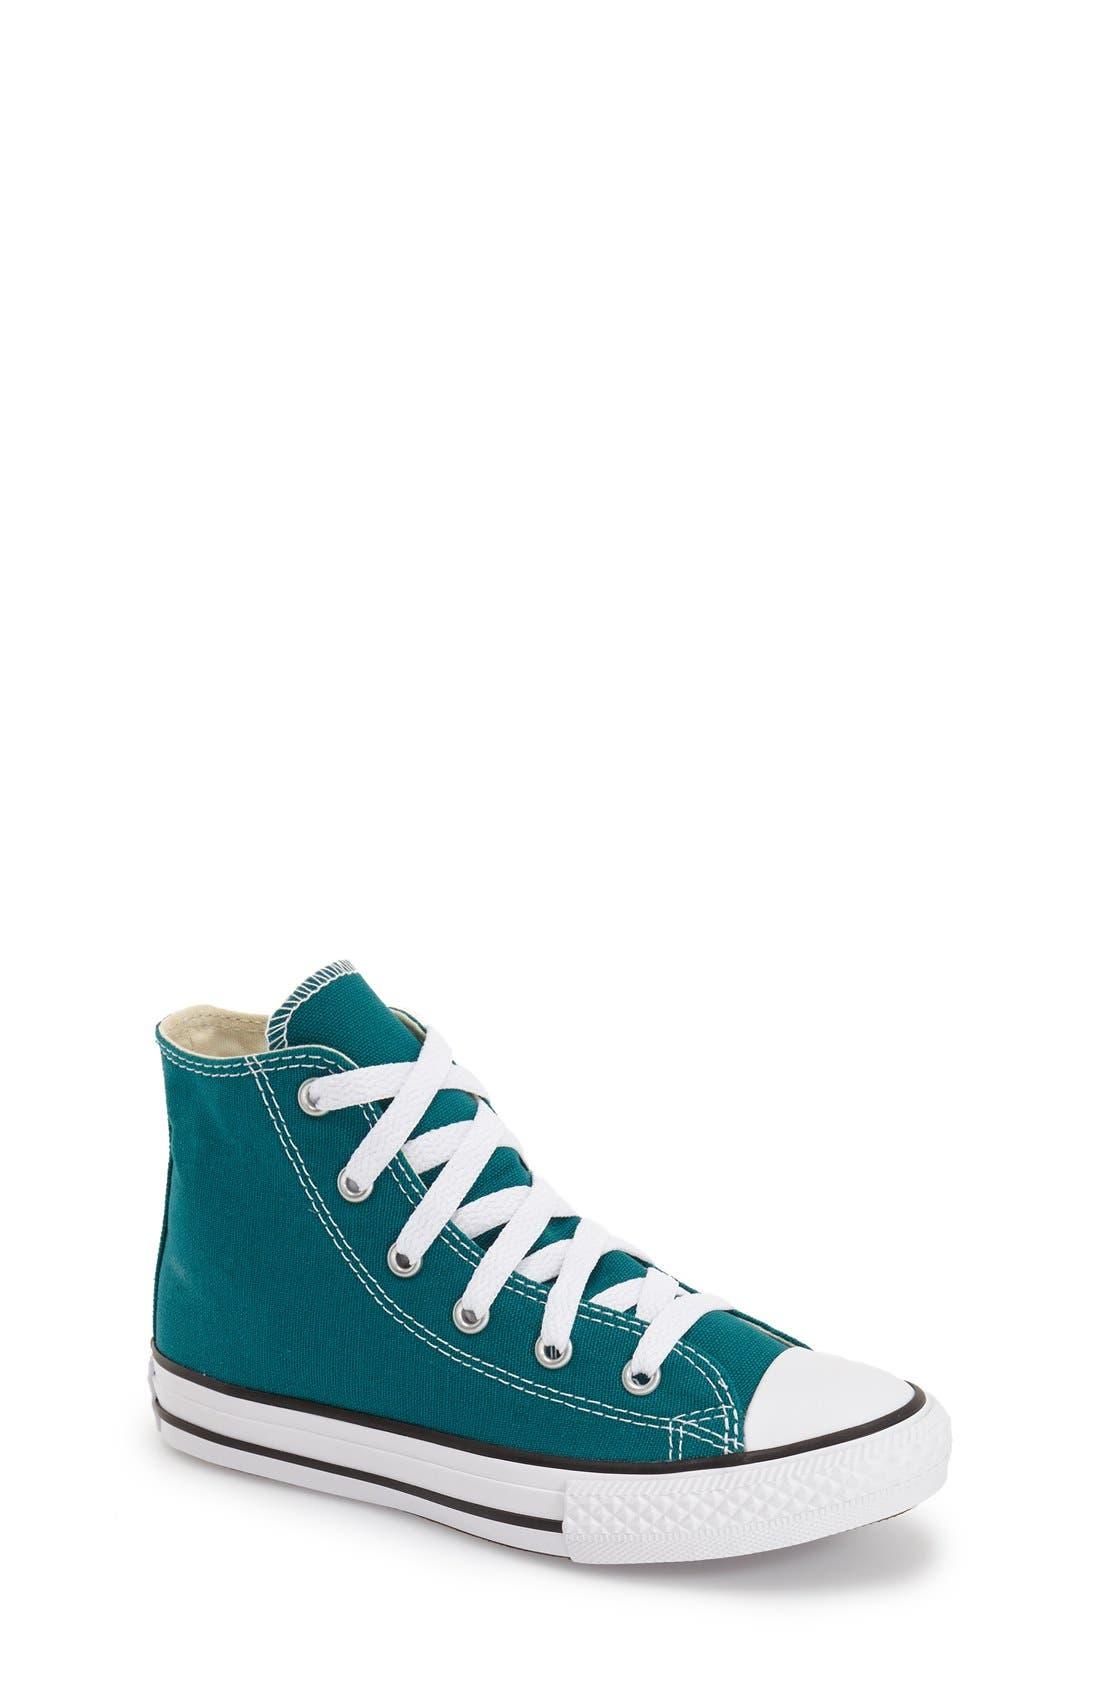 Chuck Taylor<sup>®</sup> All Star<sup>®</sup> 'Madison' High Top Sneaker,                             Main thumbnail 1, color,                             469